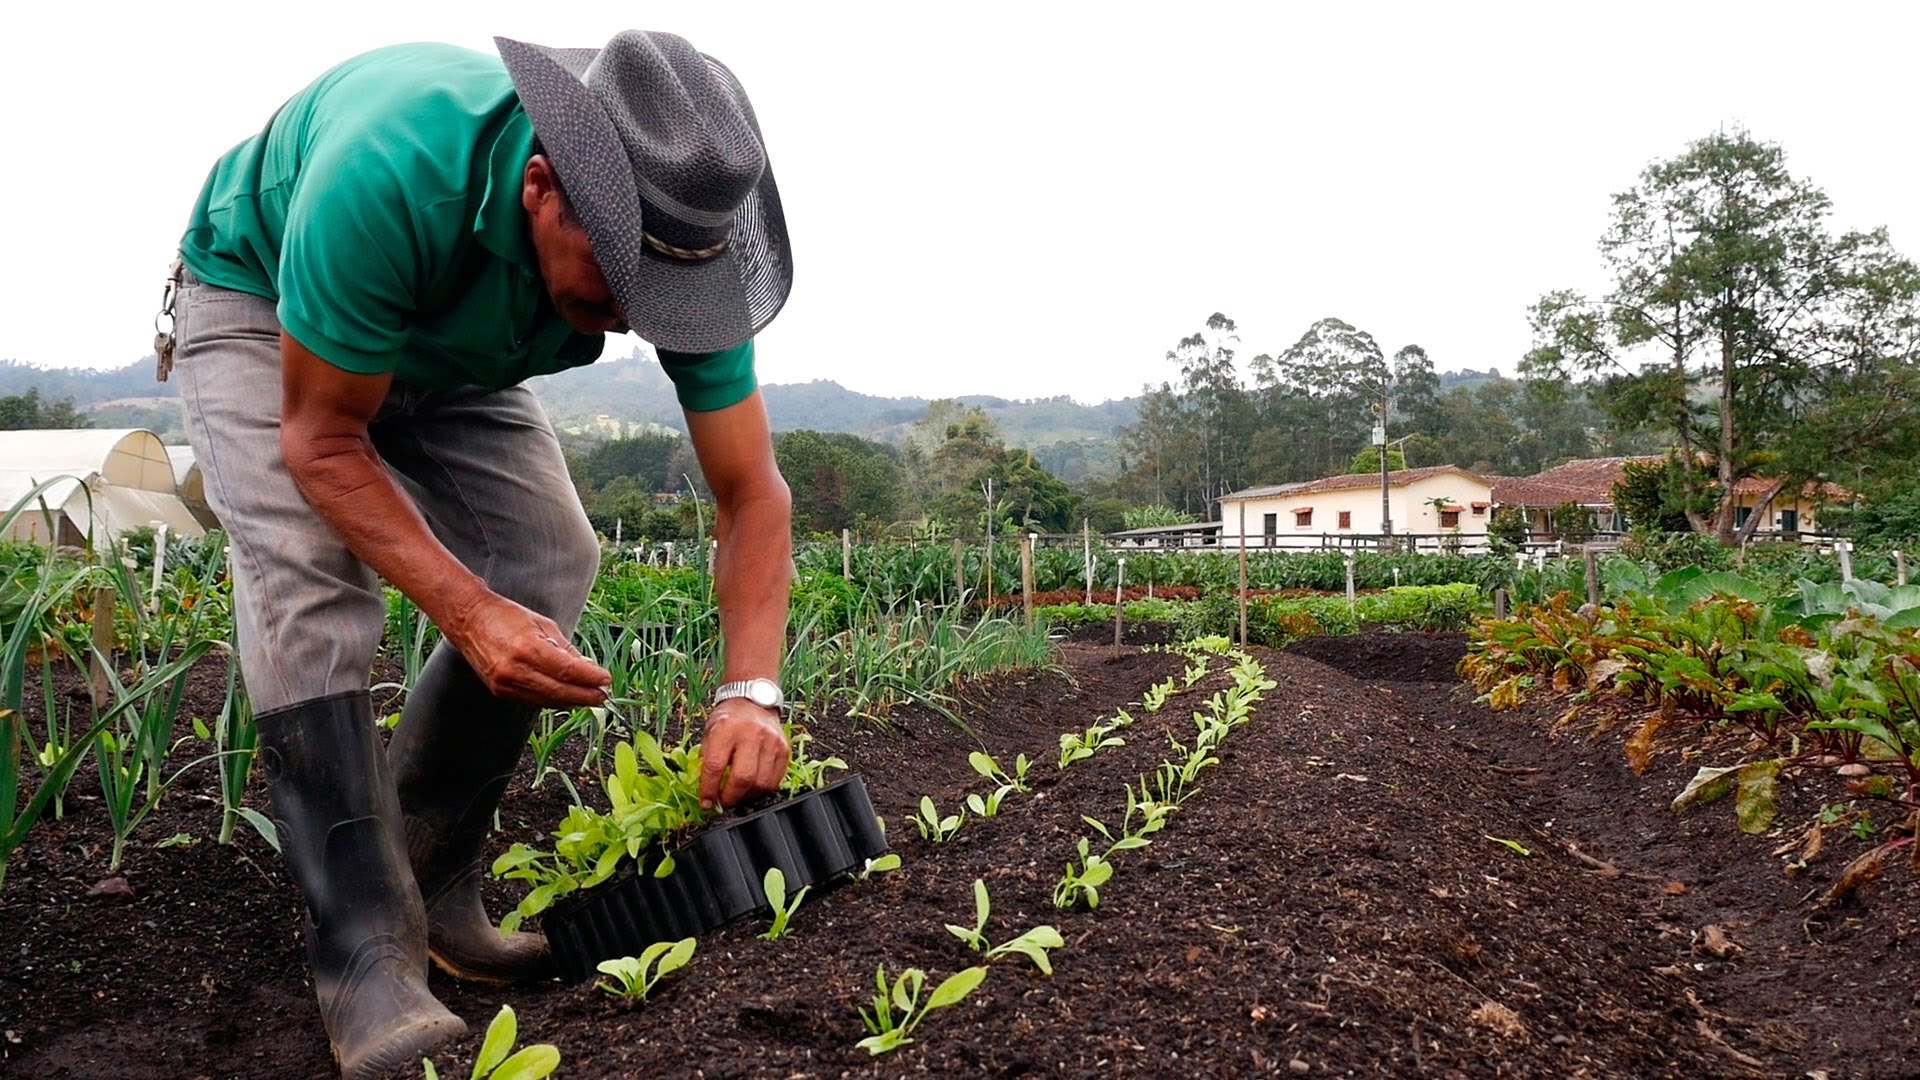 Antioquia firmó convenio para la Colonia Penal Agrícola